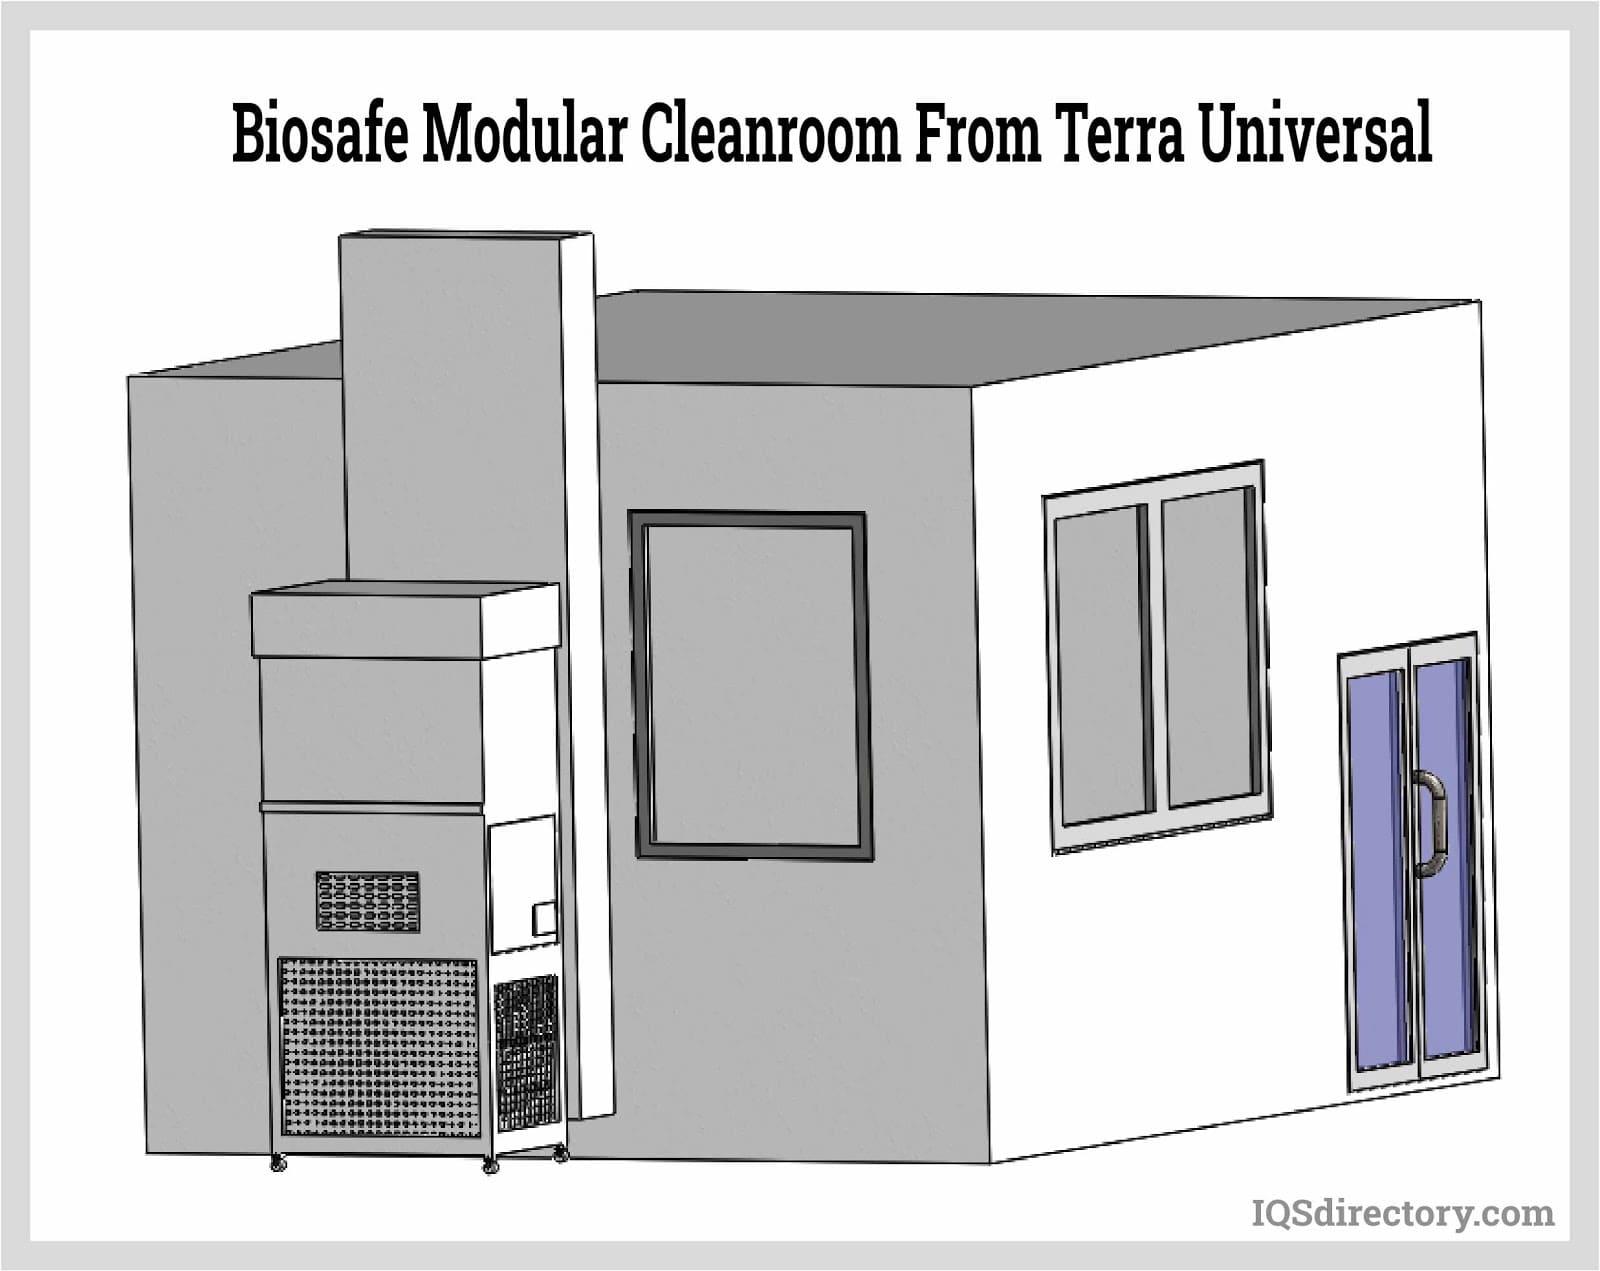 BioSafe Modular Cleanroom from Terra Universal